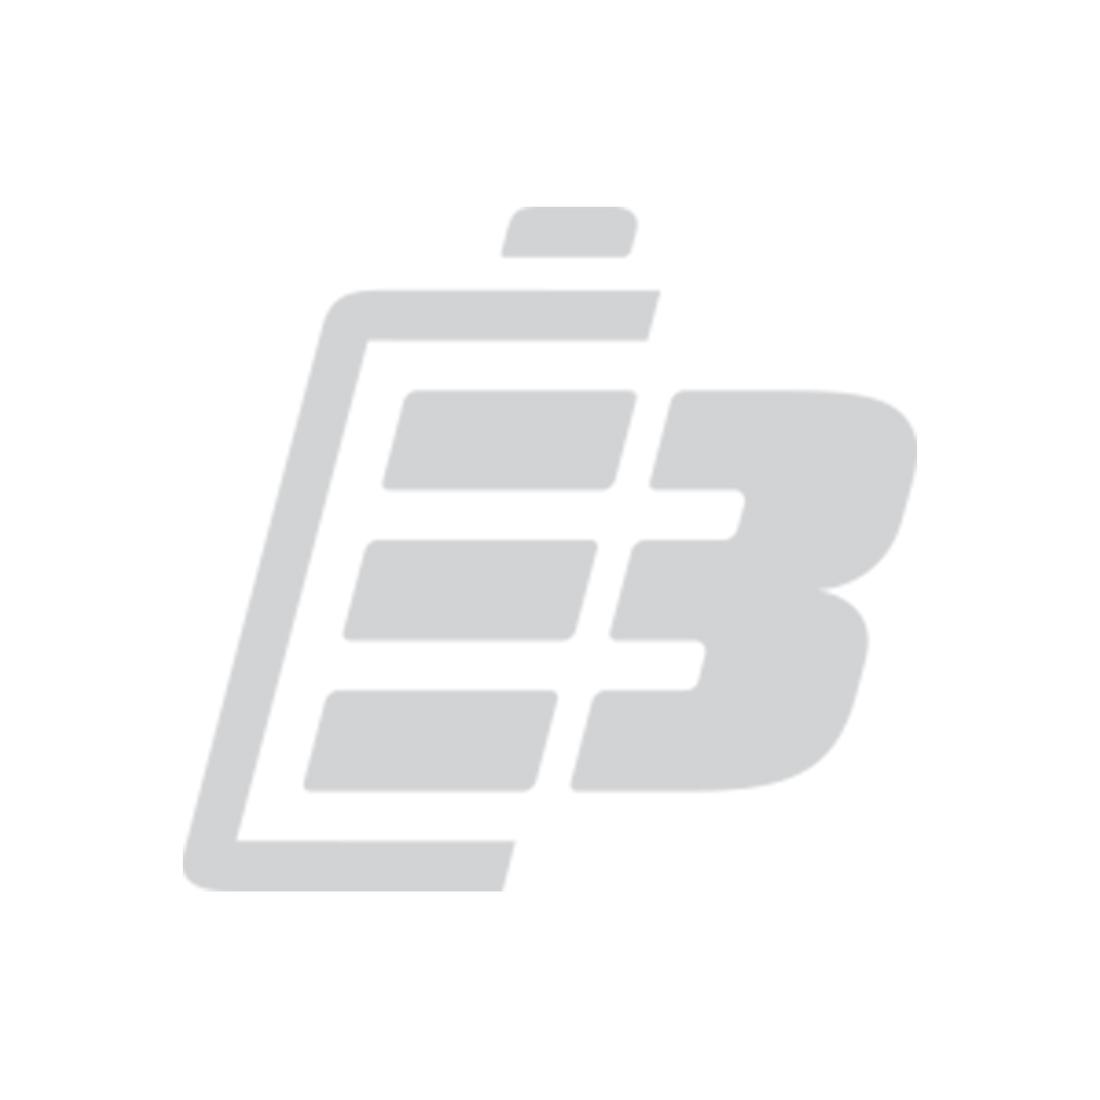 Laptop battery Lenovo IdeaPad Y470_1